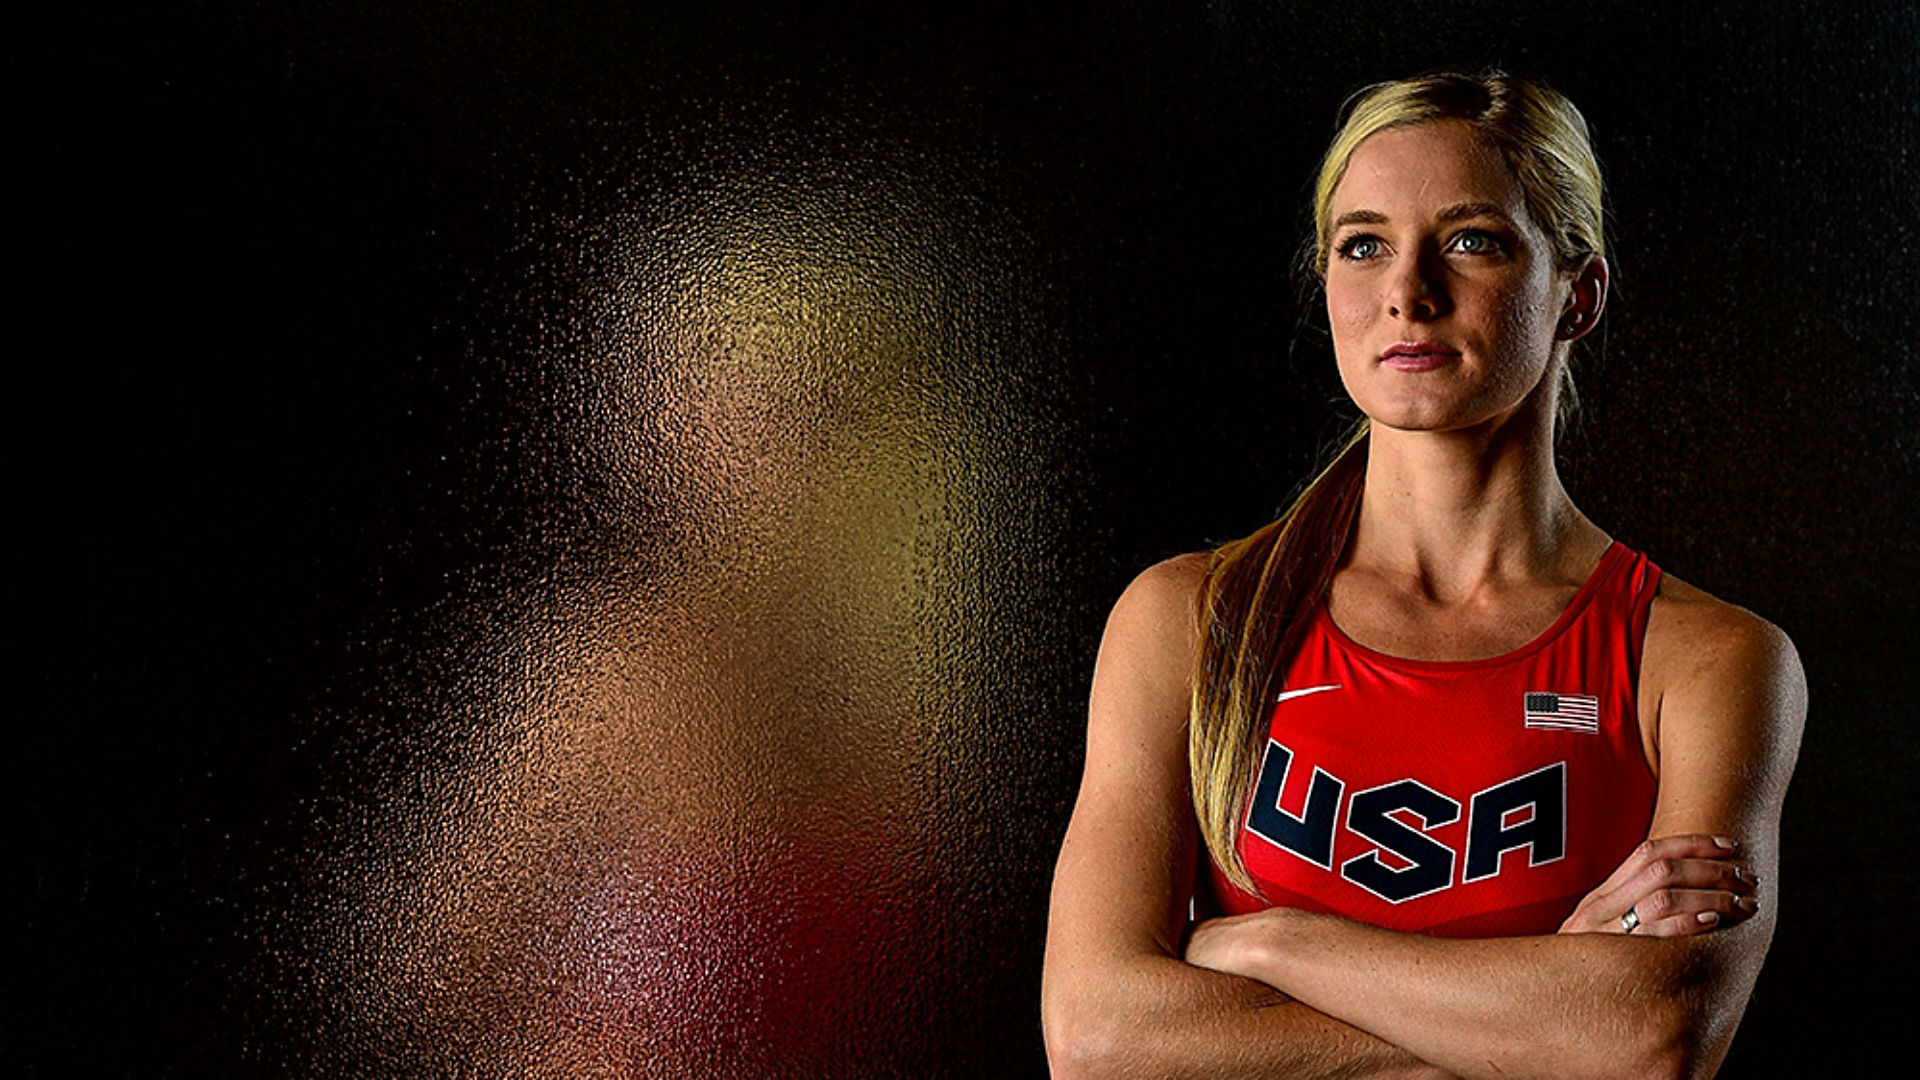 Top 10 Inspiring Female Athletes On Women Fitness